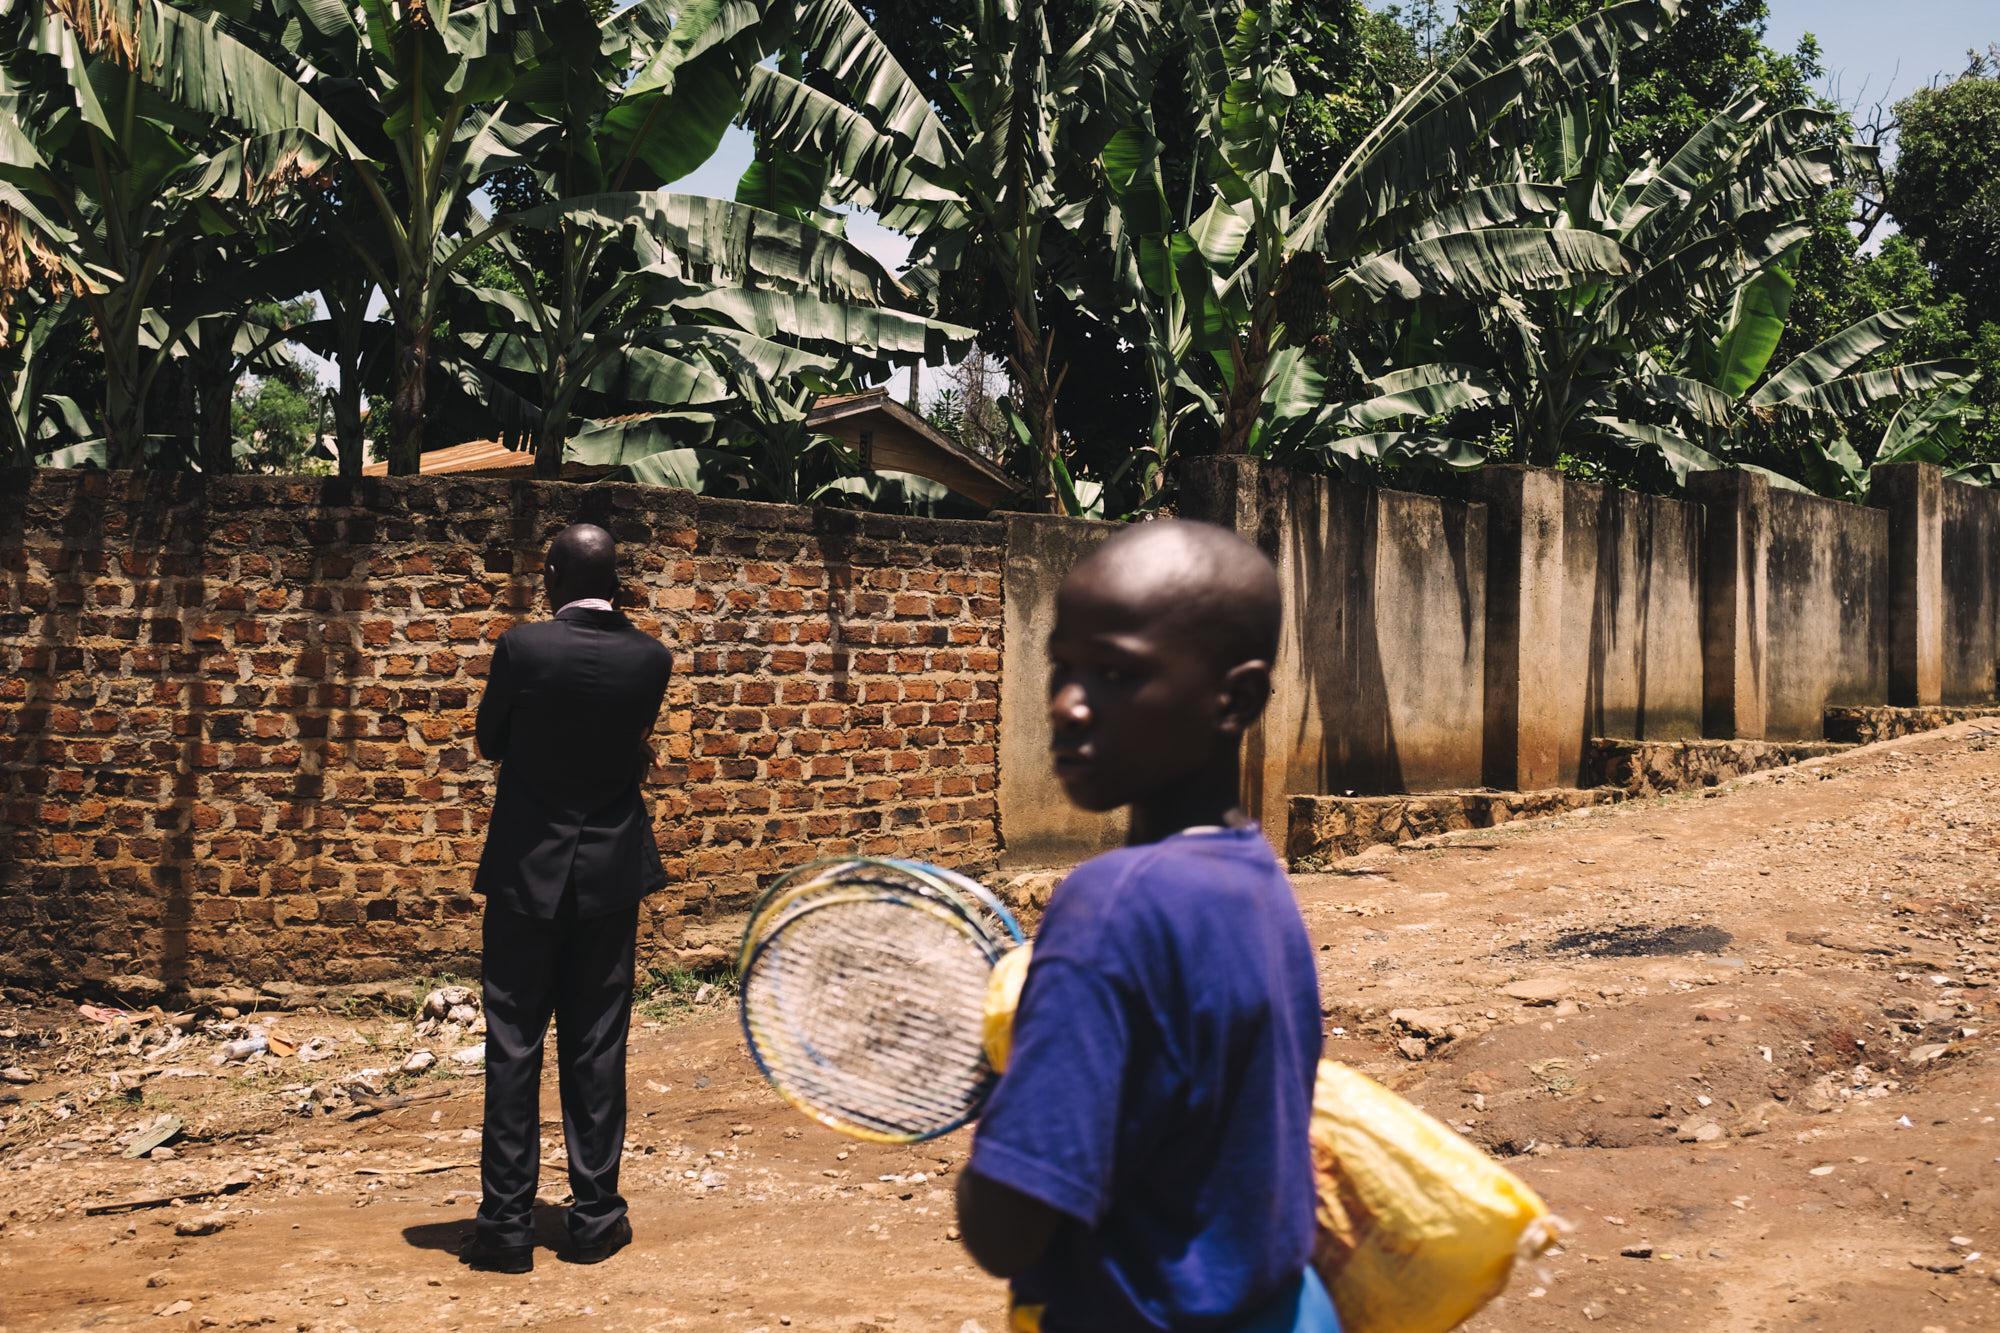 2019_04_19_Google_India_Uganda_Beruit_0452.jpg